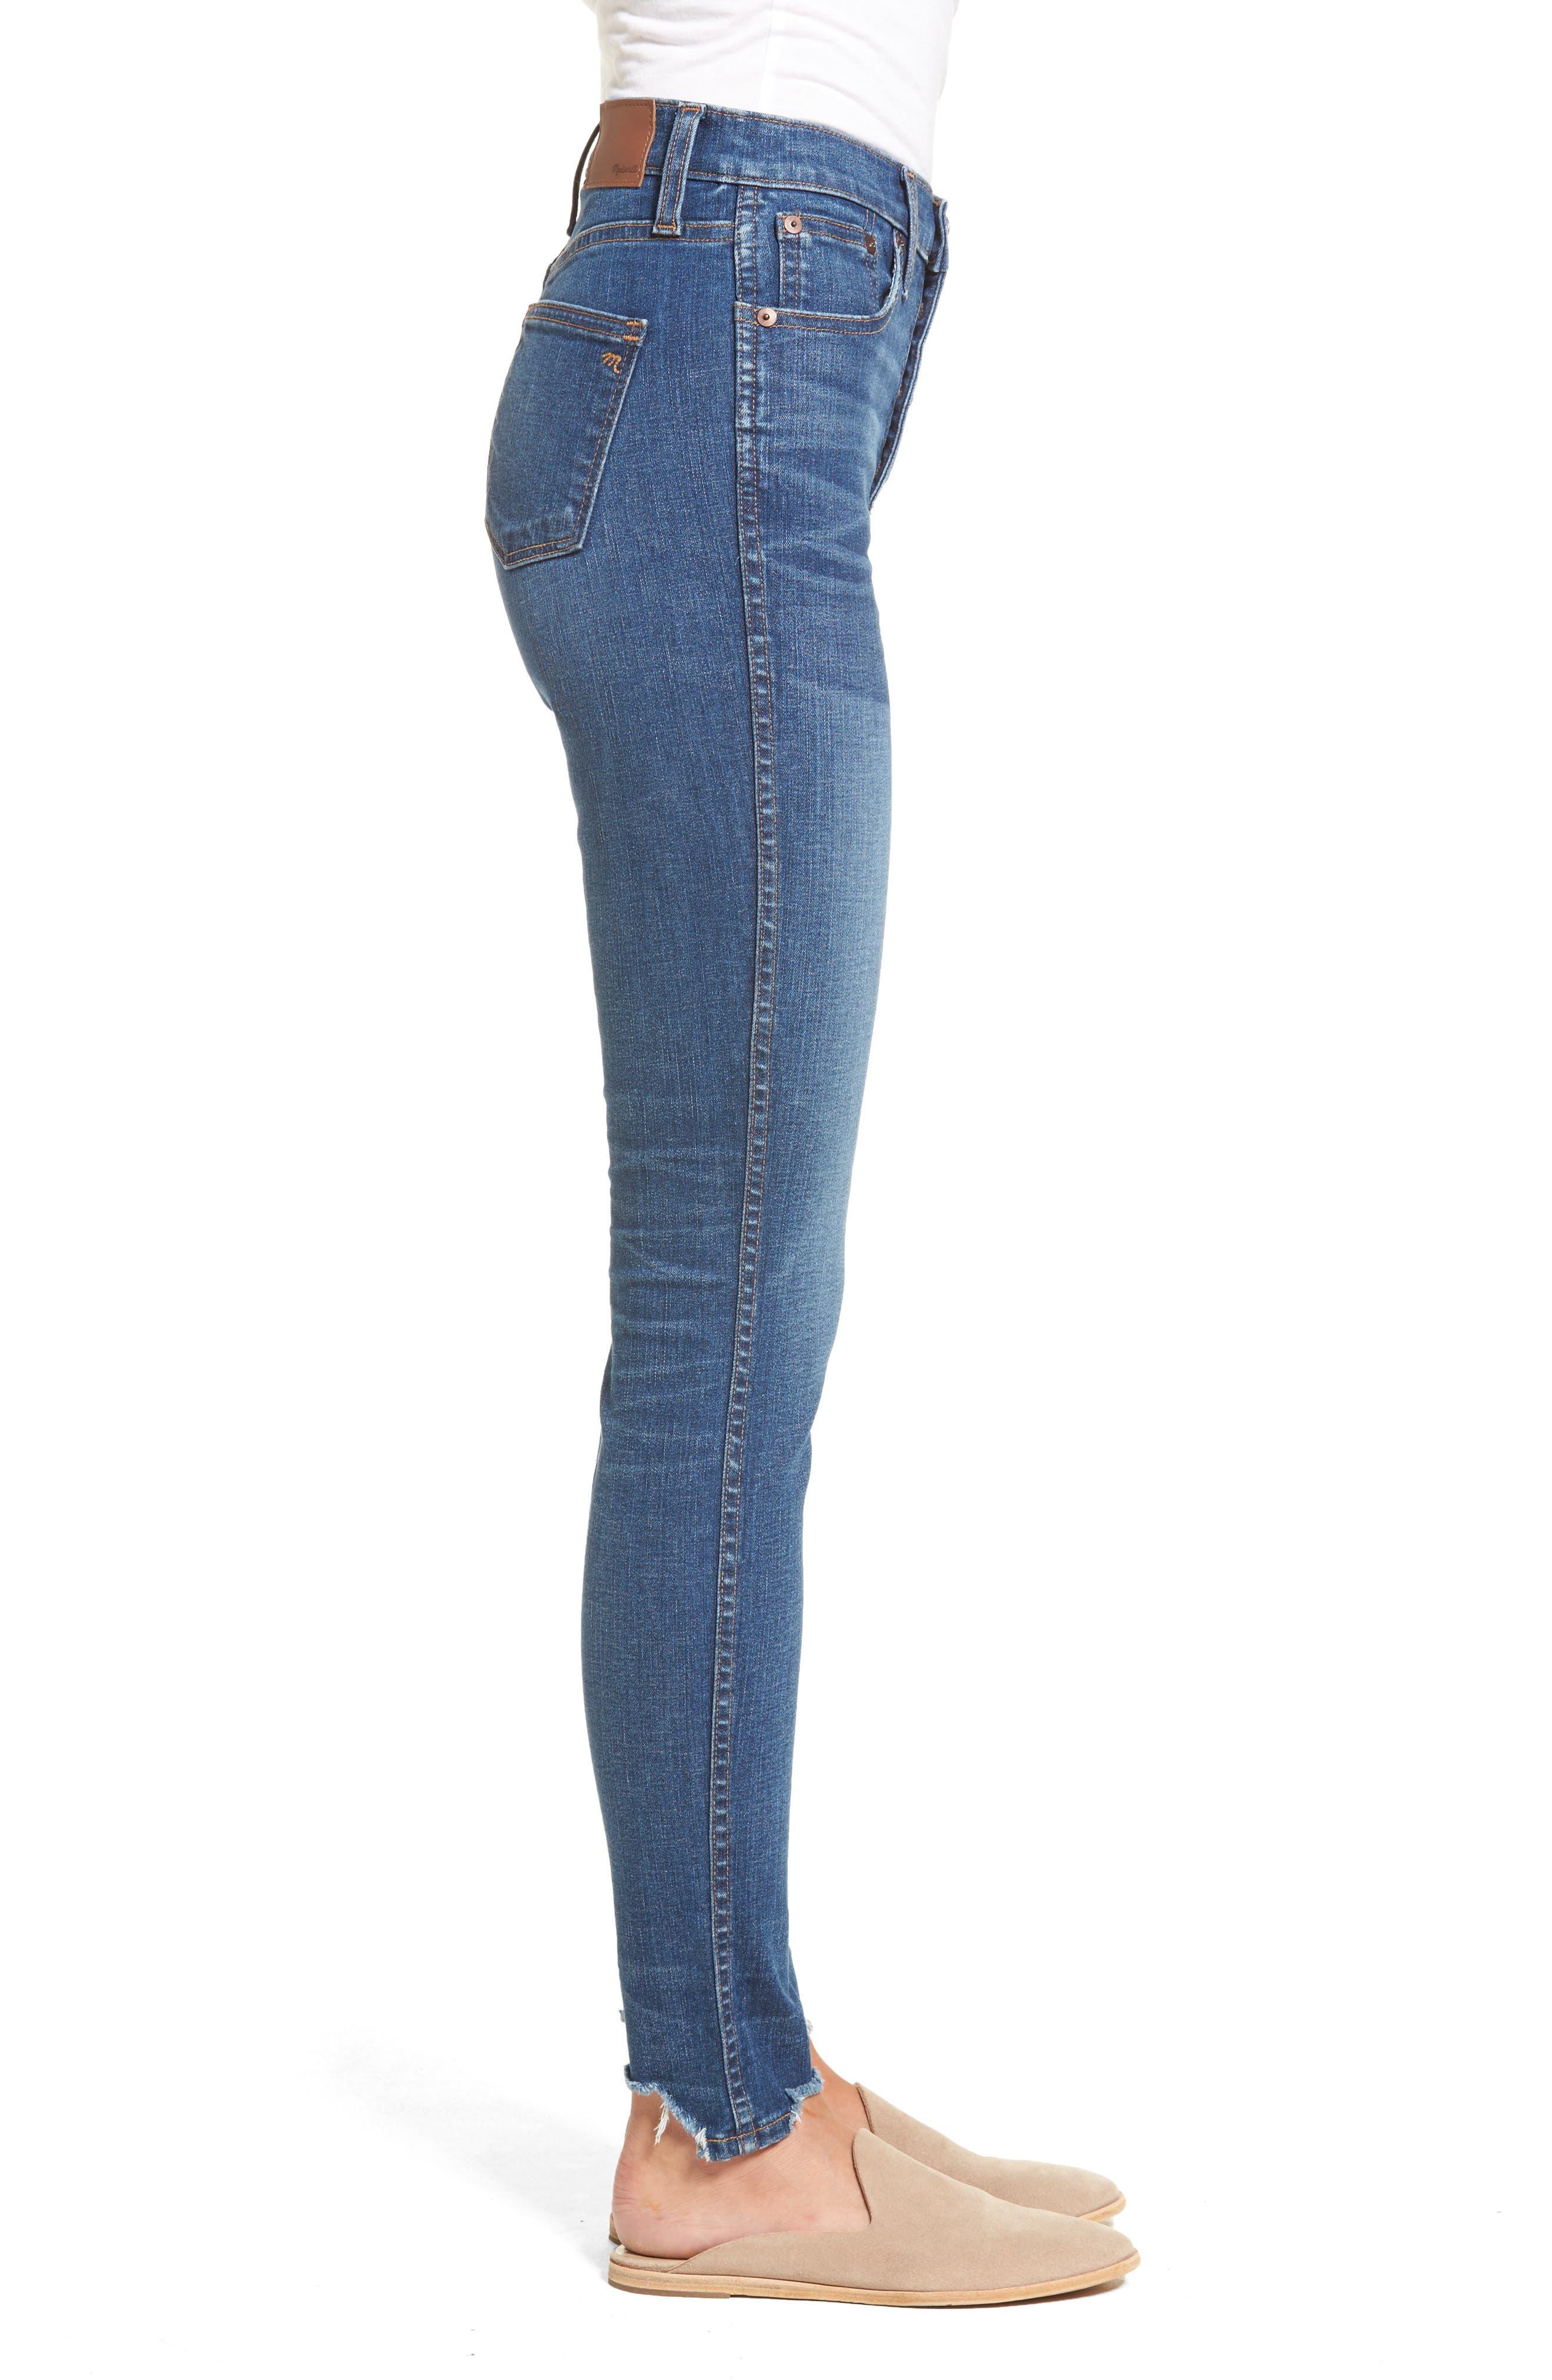 10-Inch Chewed Hem Skinny Jeans,                             Alternate thumbnail 3, color,                             400